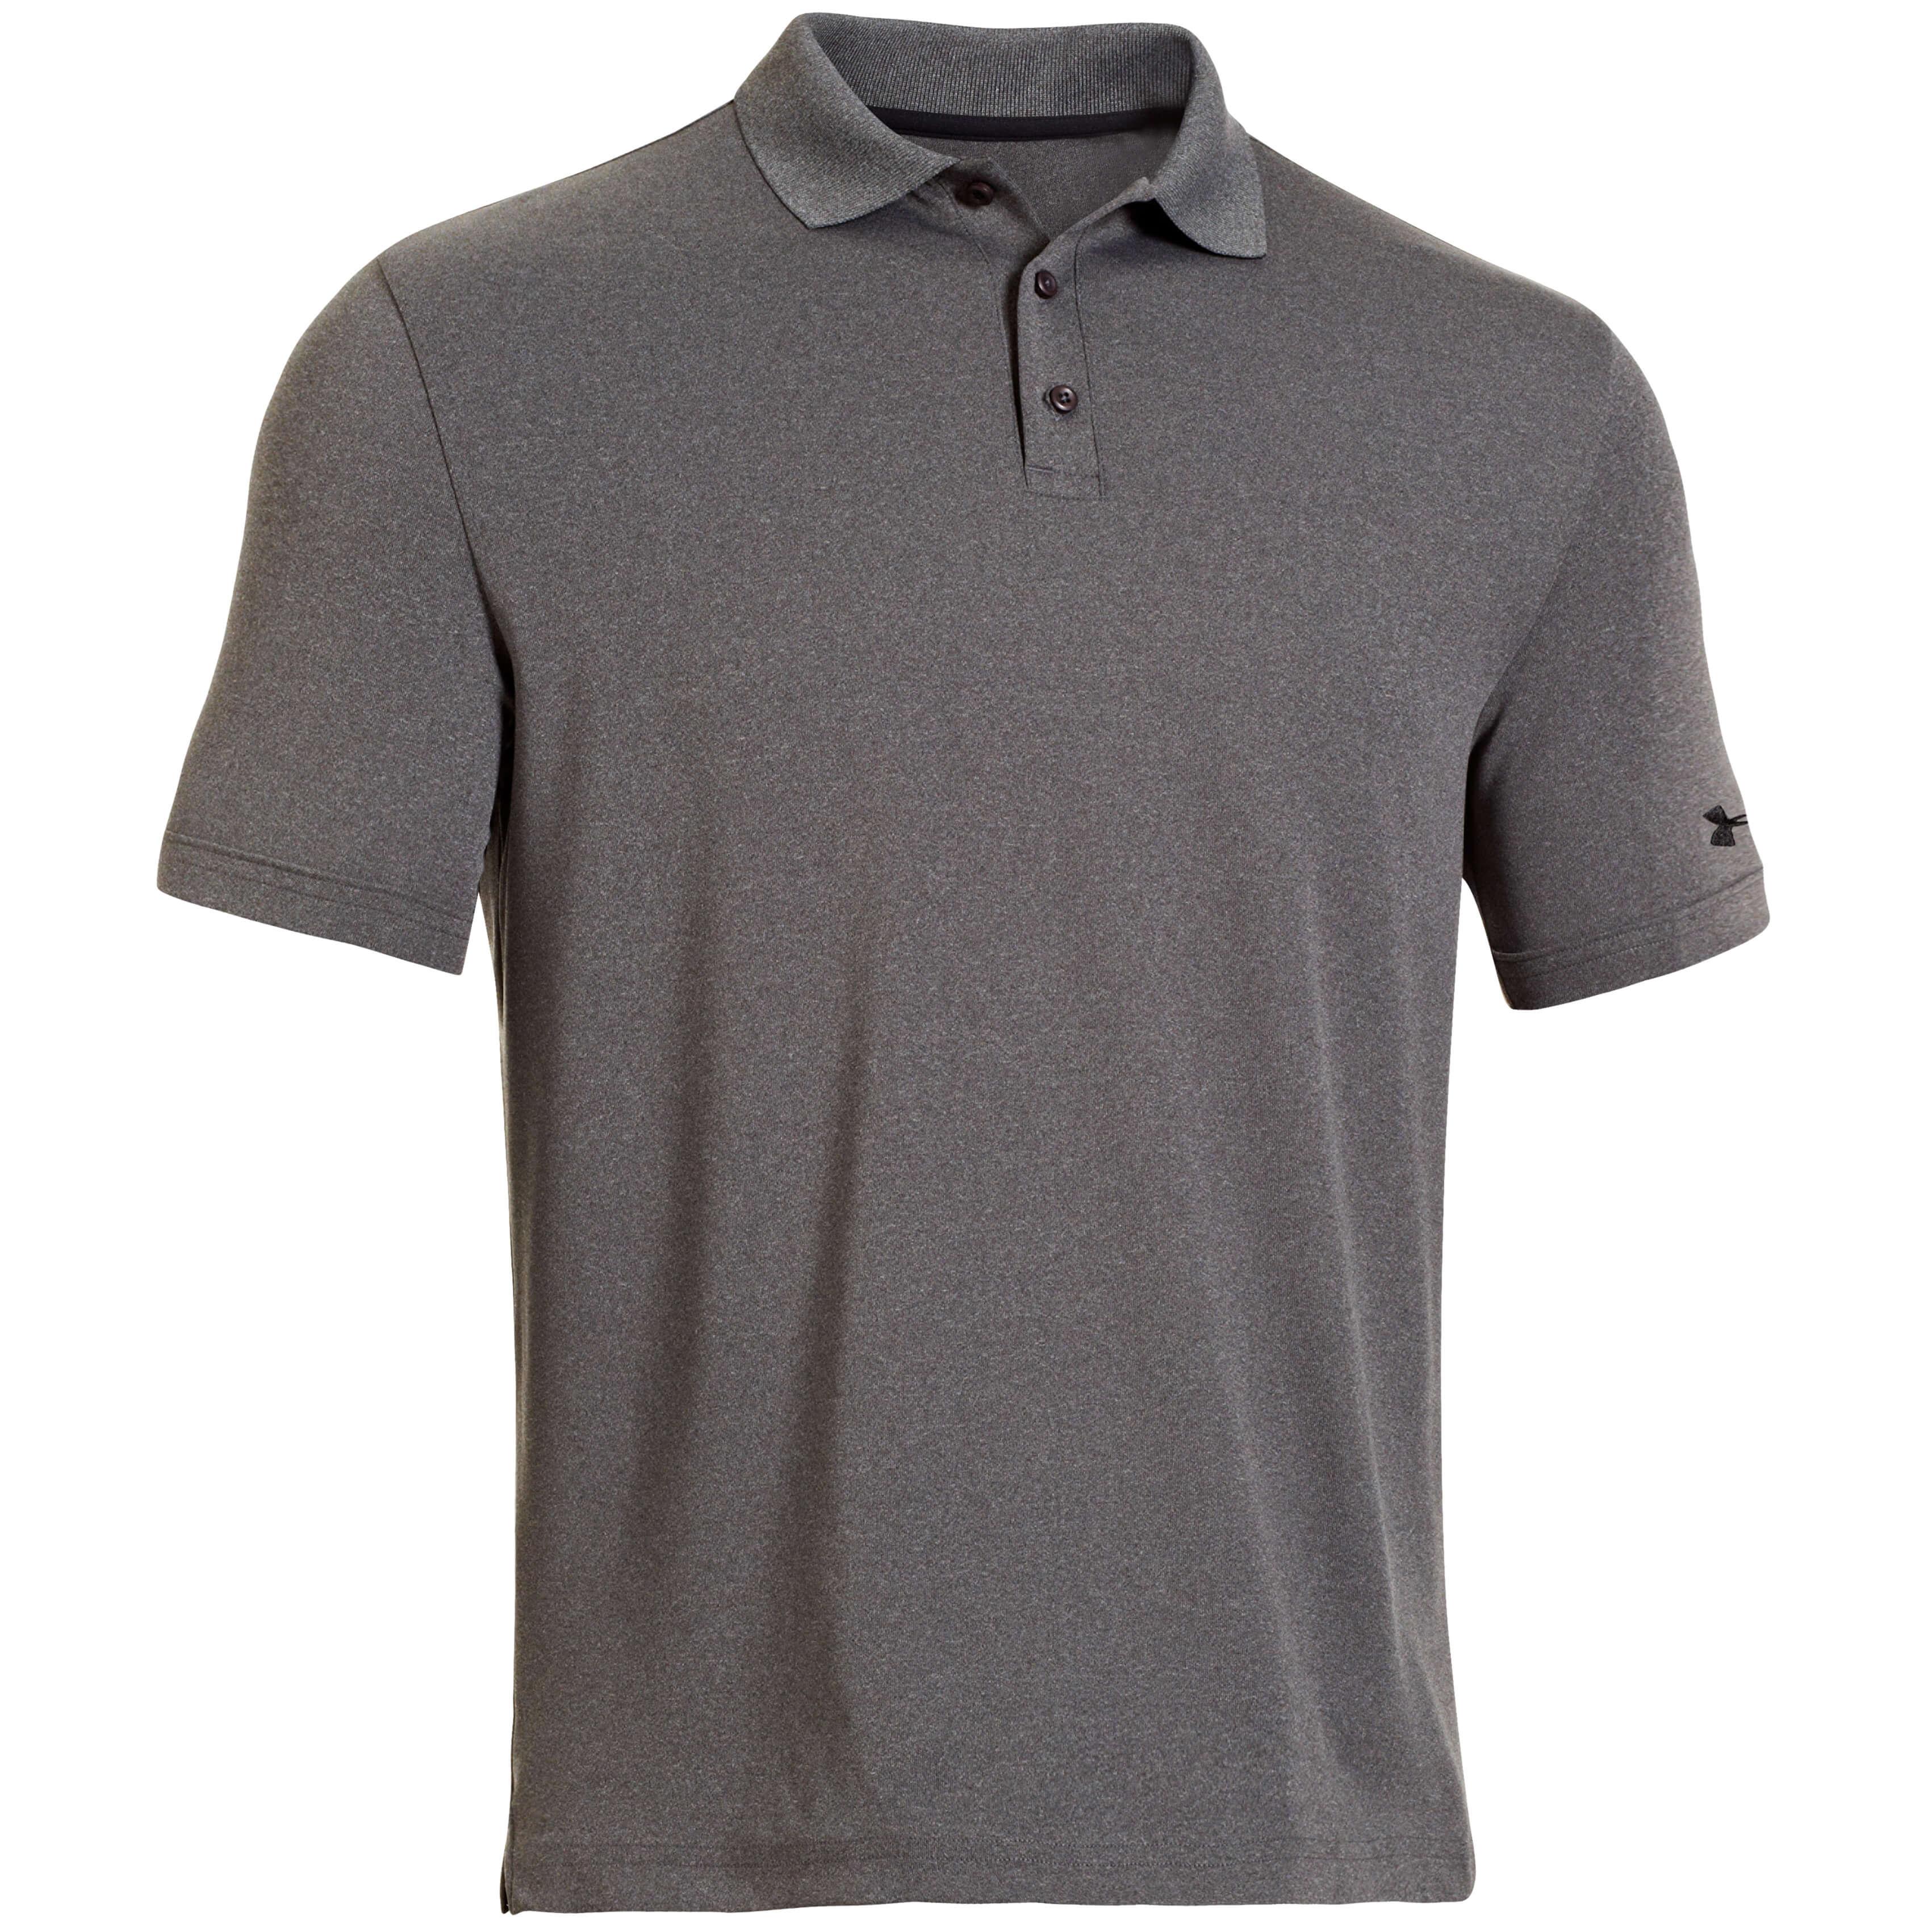 Under-Armour-Mens-Medal-Play-Performance-Polo-Shirt-UA-Golf-Short-Sleeve thumbnail 17